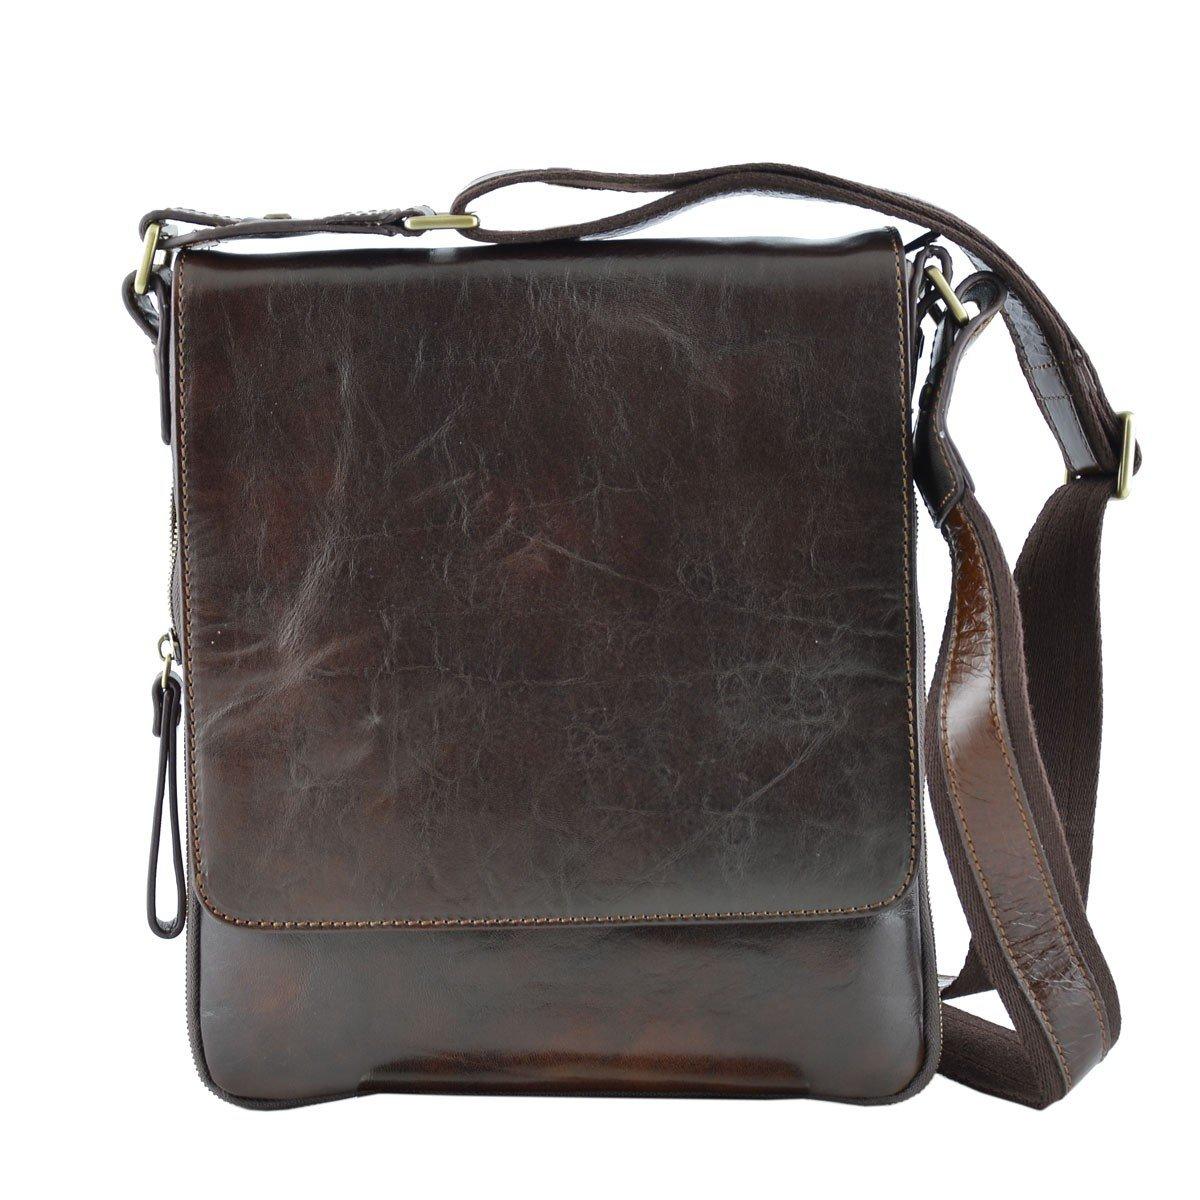 Dream Leather Bags Made in Italy Genuine Leather メンズ 529-3 US サイズ: 1 M US カラー: ブラウン   B076RDT6K2